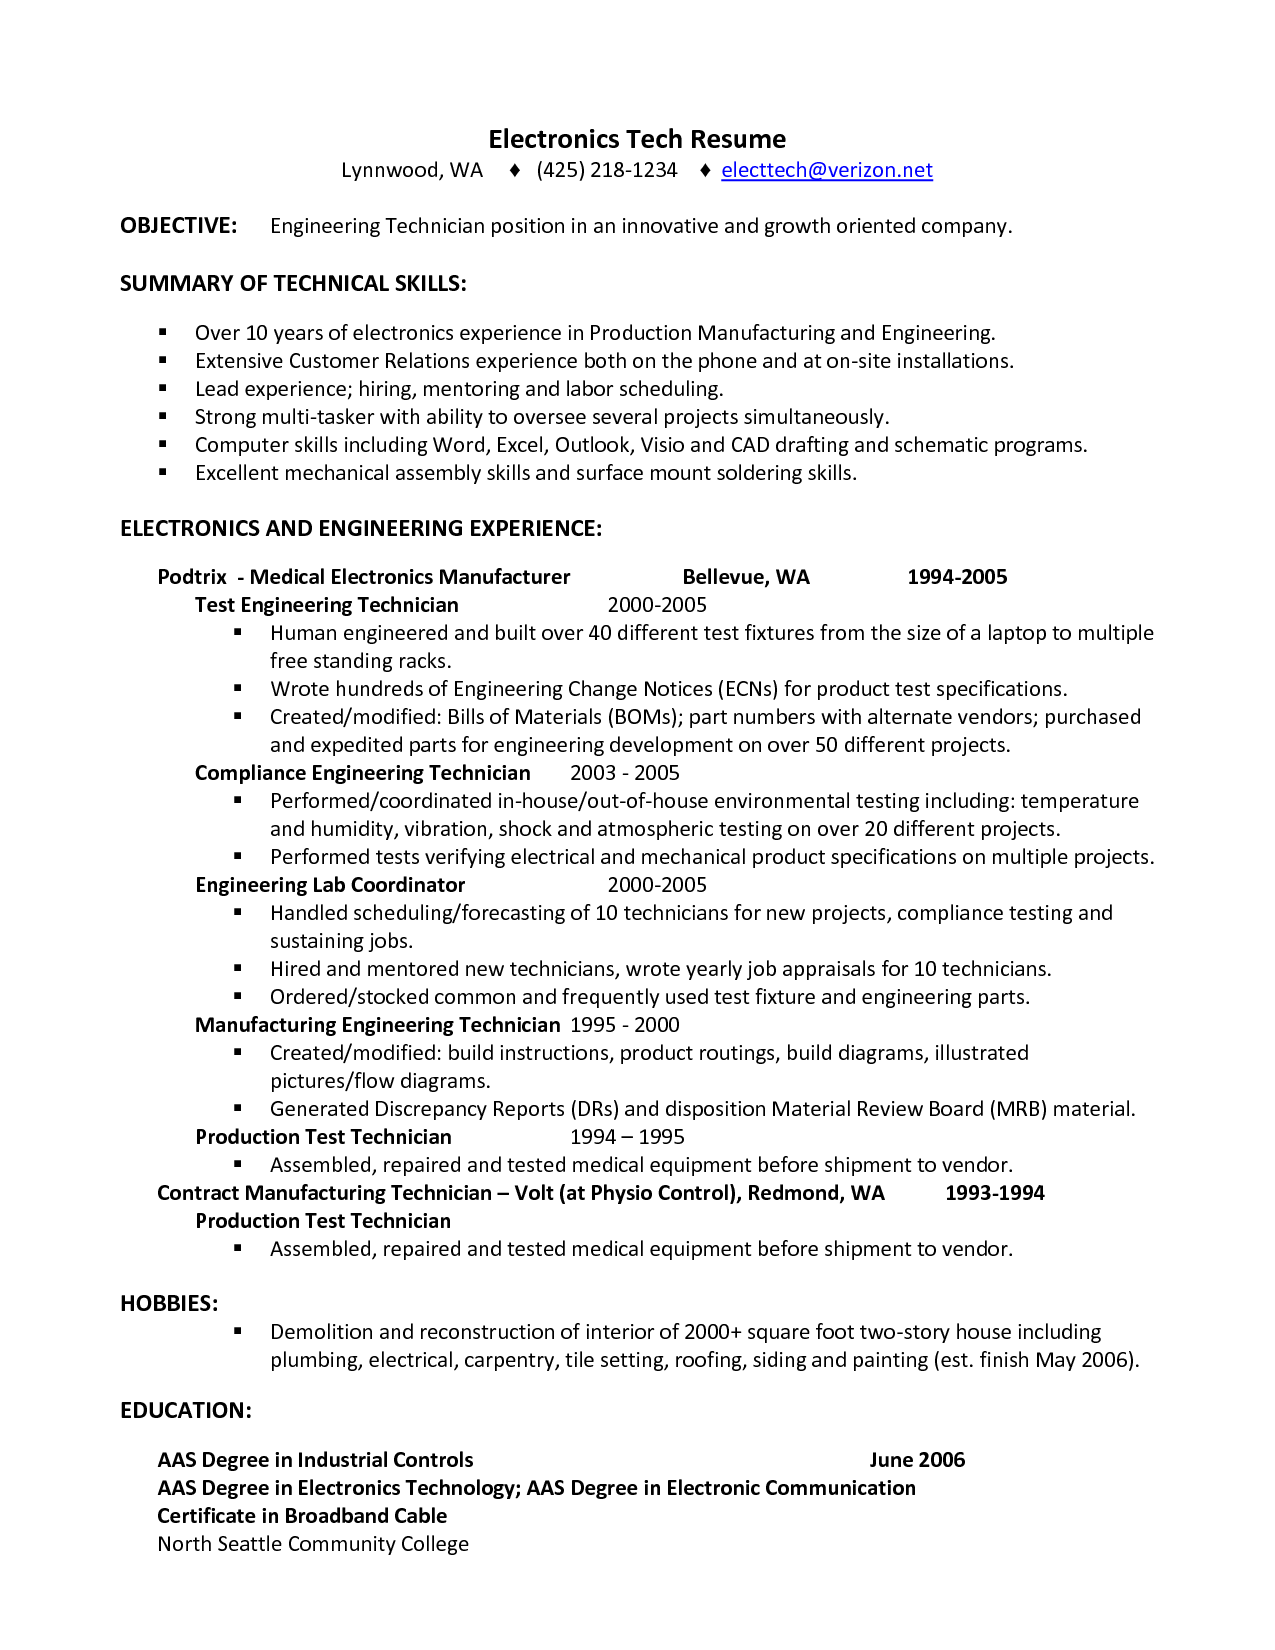 Electronic Assembly Resume